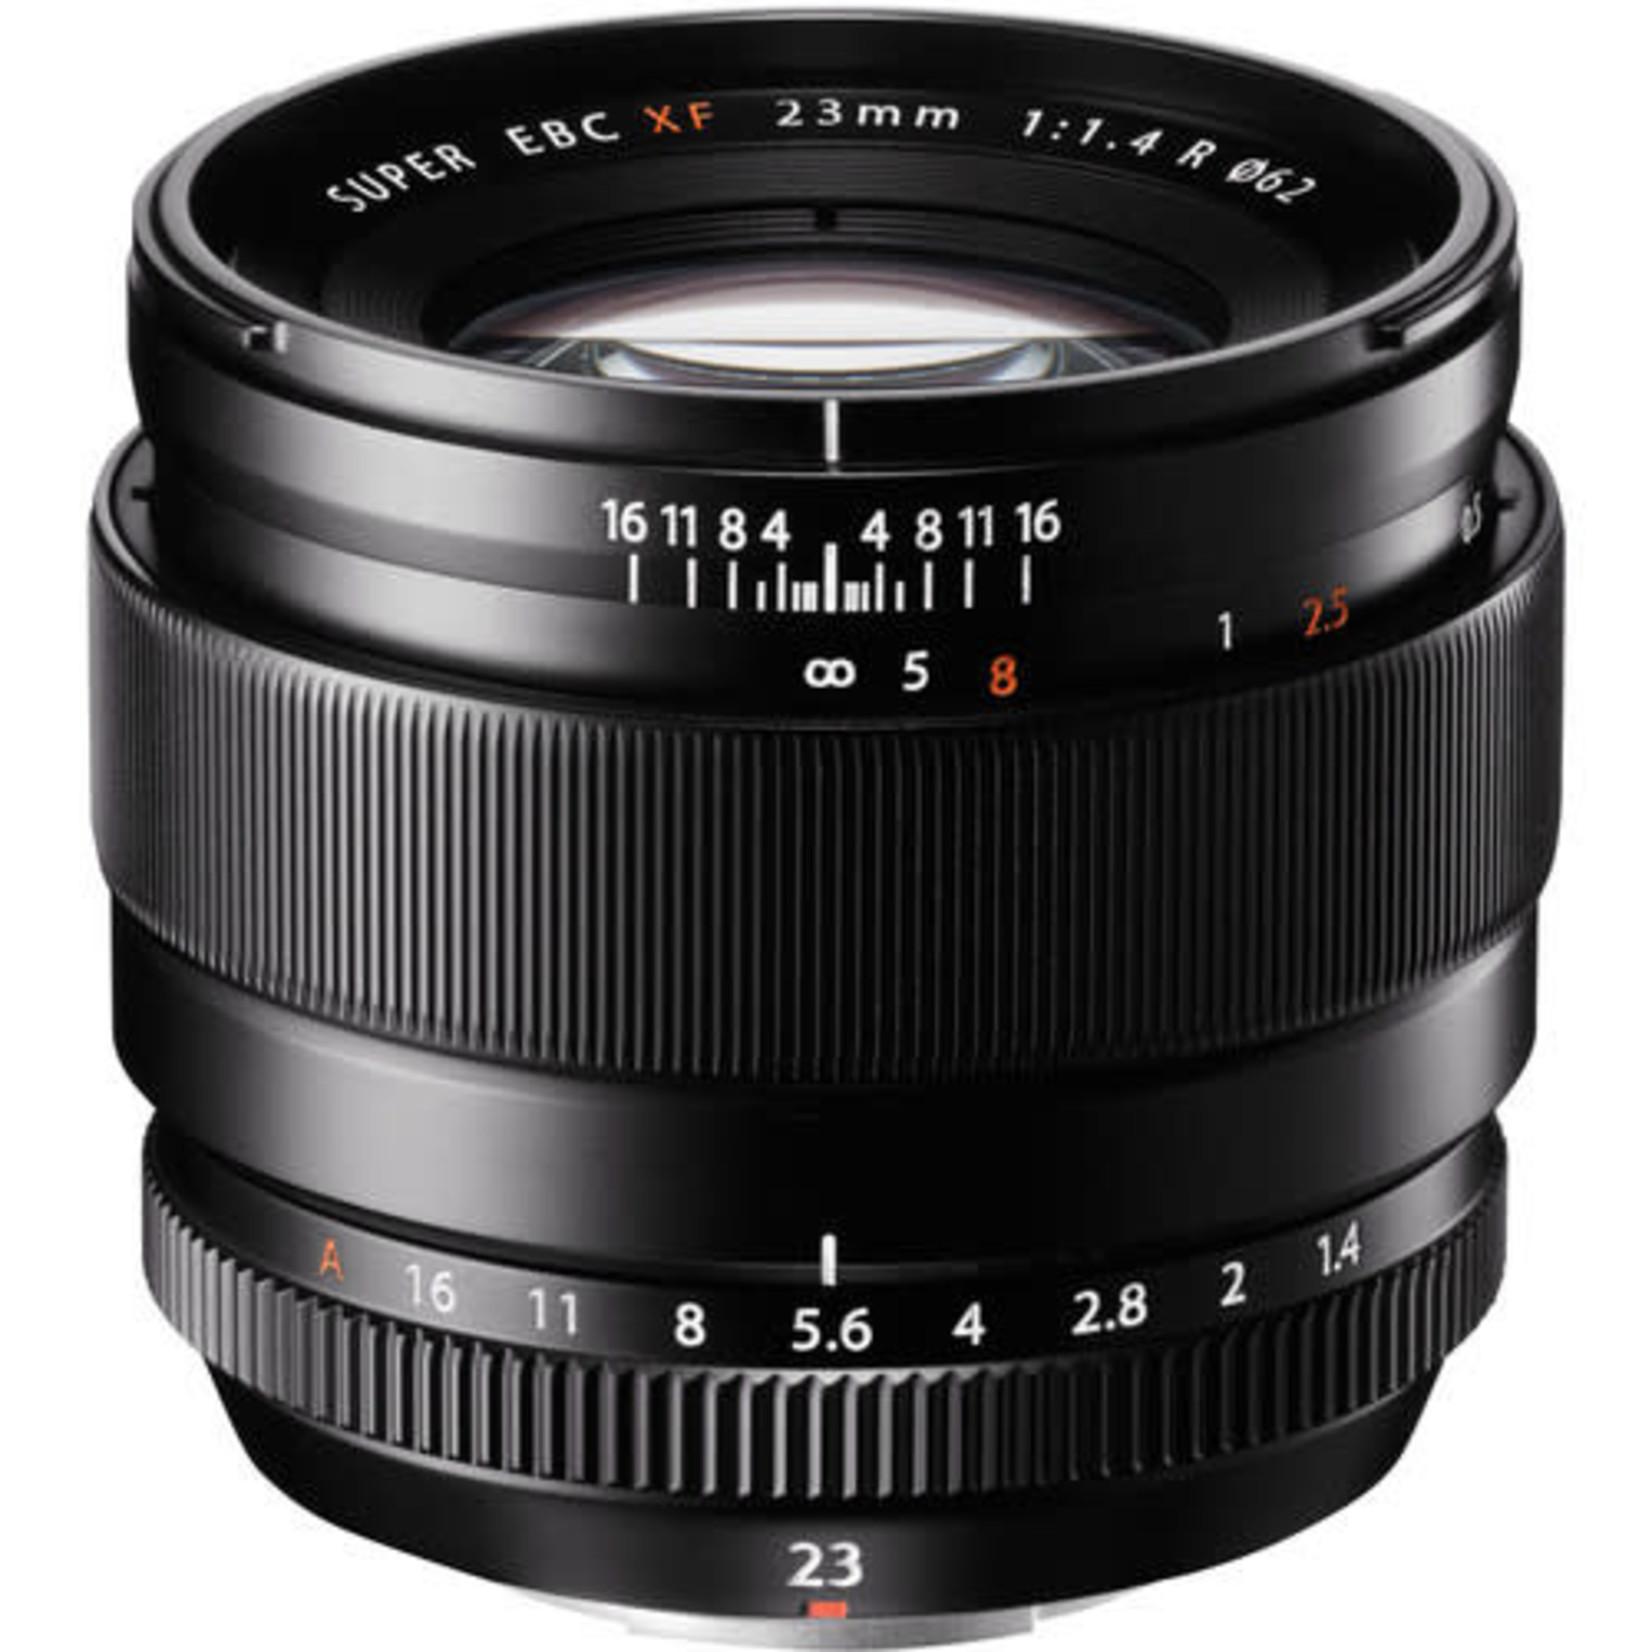 FujiFilm FujiFilm XF 23mm f/1.4 R Lens